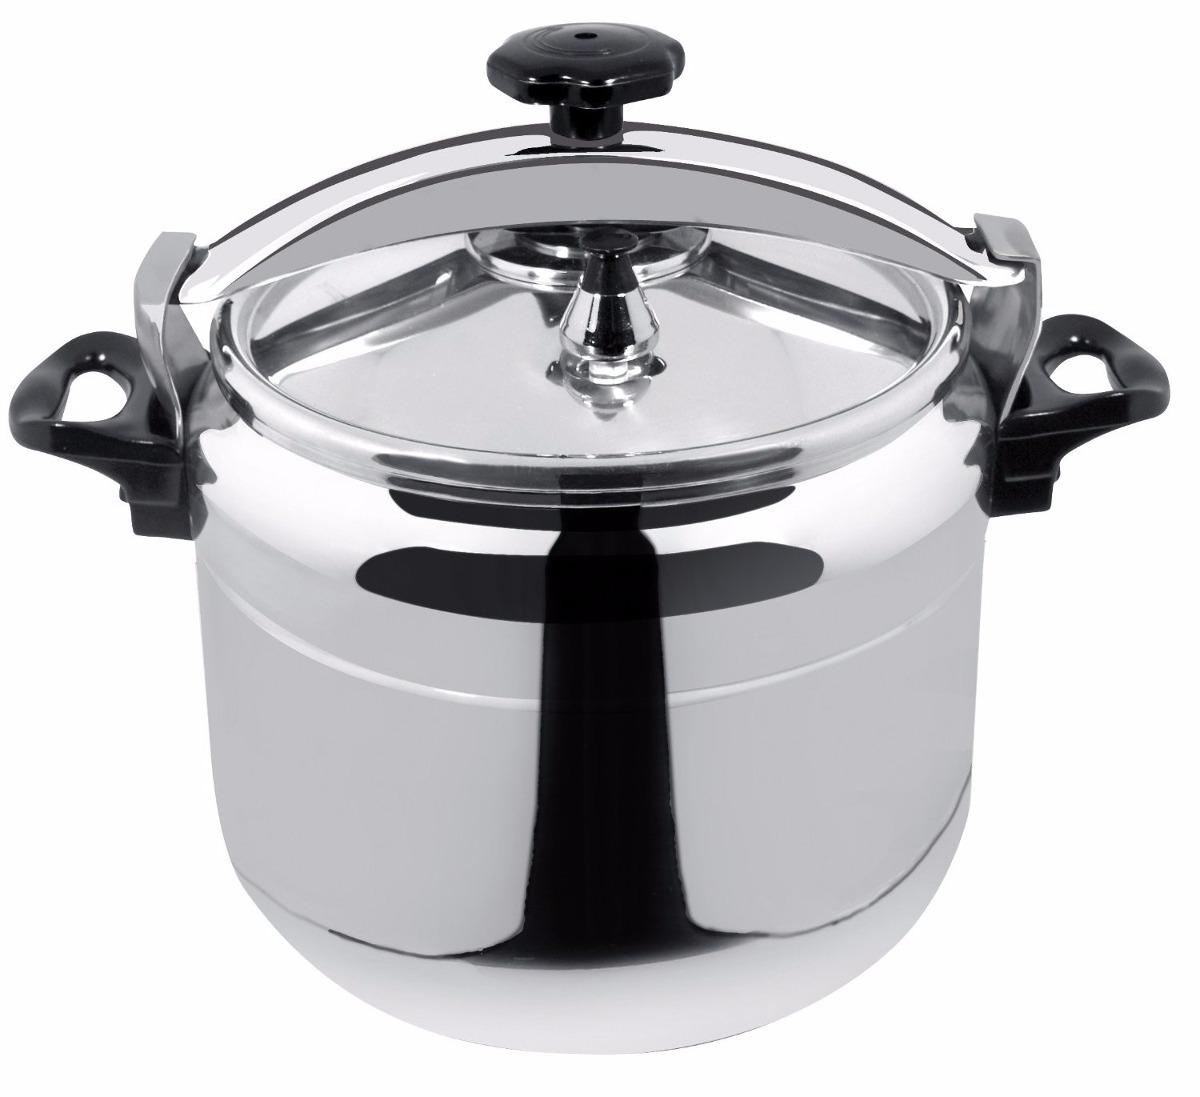 Olla de presion chef 15 litros magefesa express - Ikea olla a presion ...